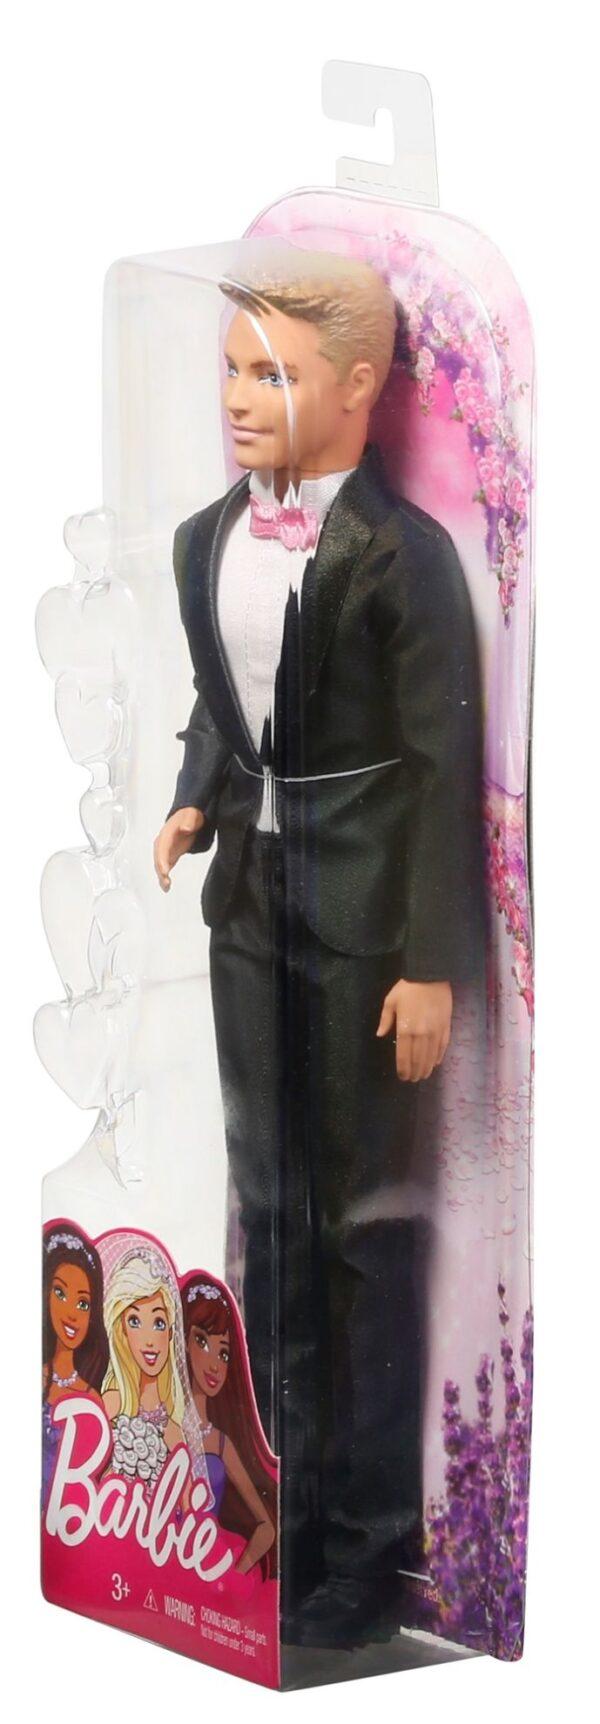 Ken Sposo - Barbie - Toys Center - Barbie - Fashion dolls